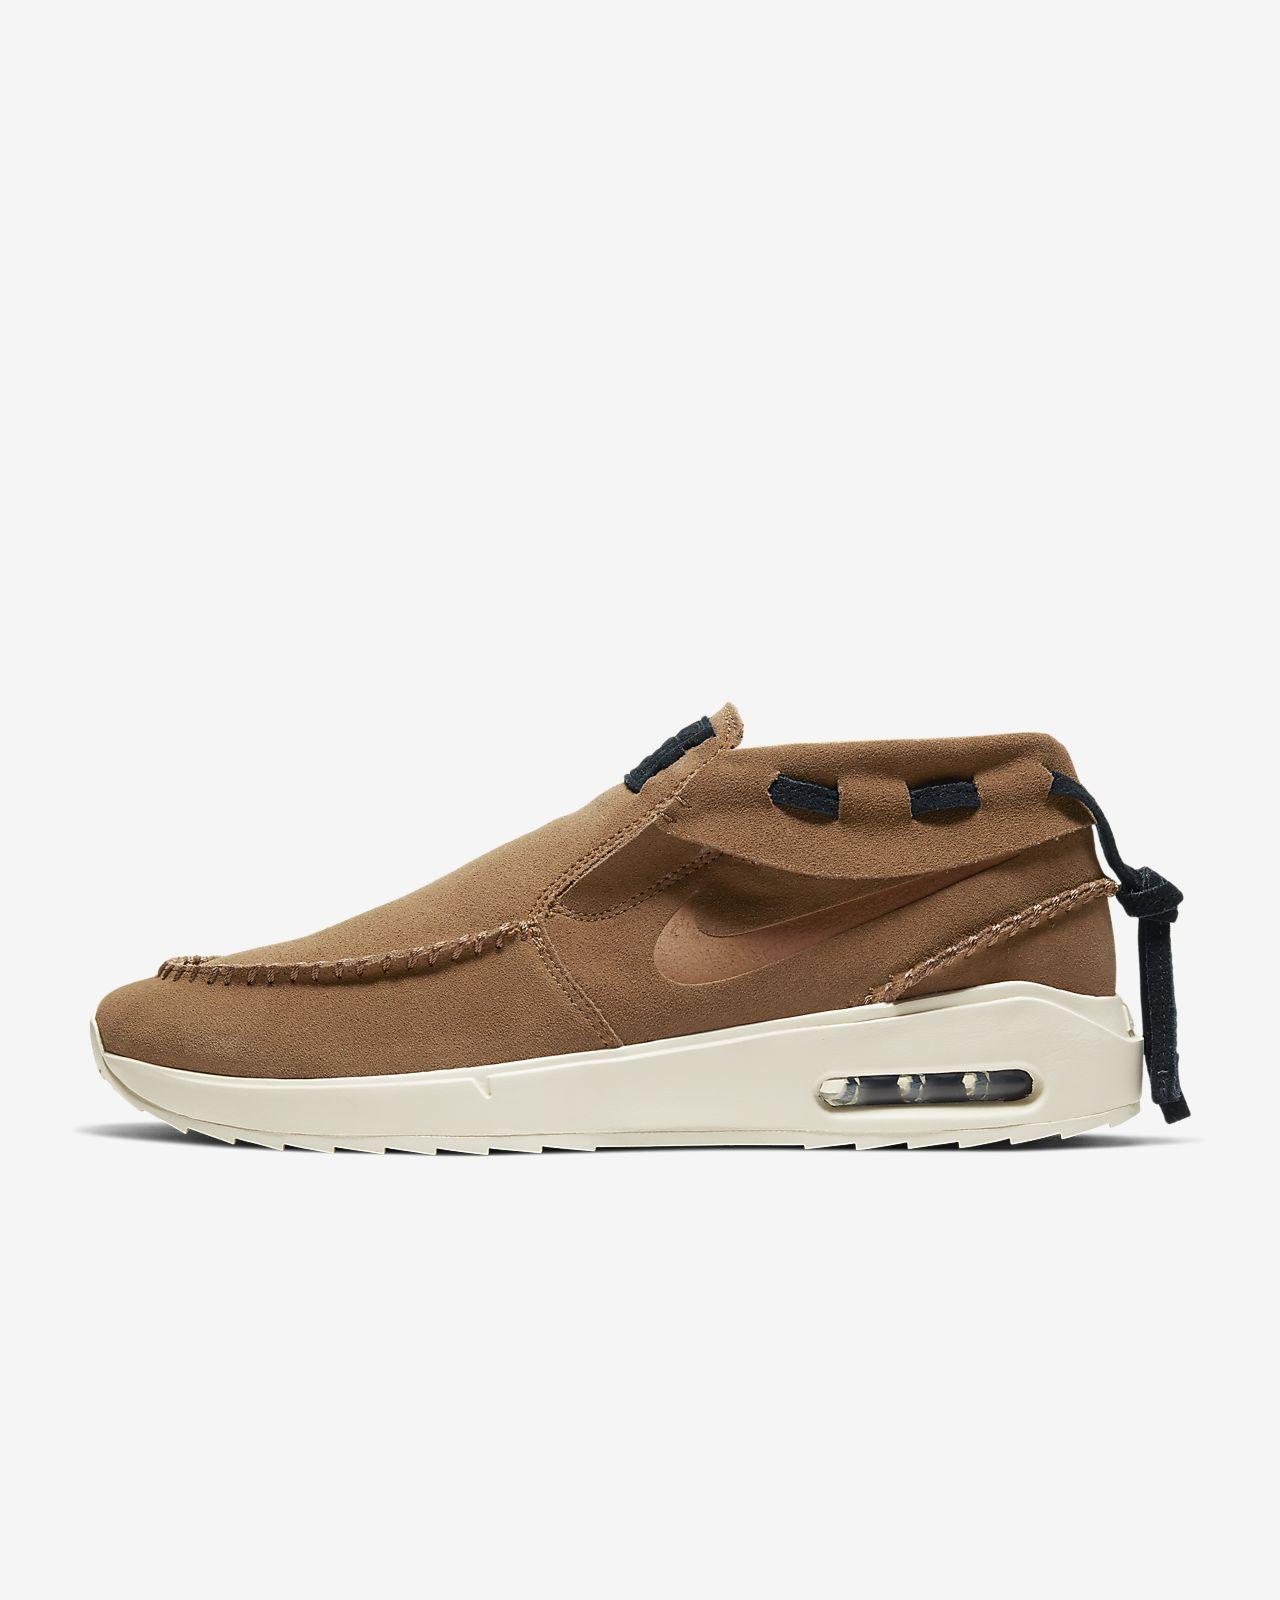 Nike SB Air Max Janoski 2 Moc 男/女滑板鞋